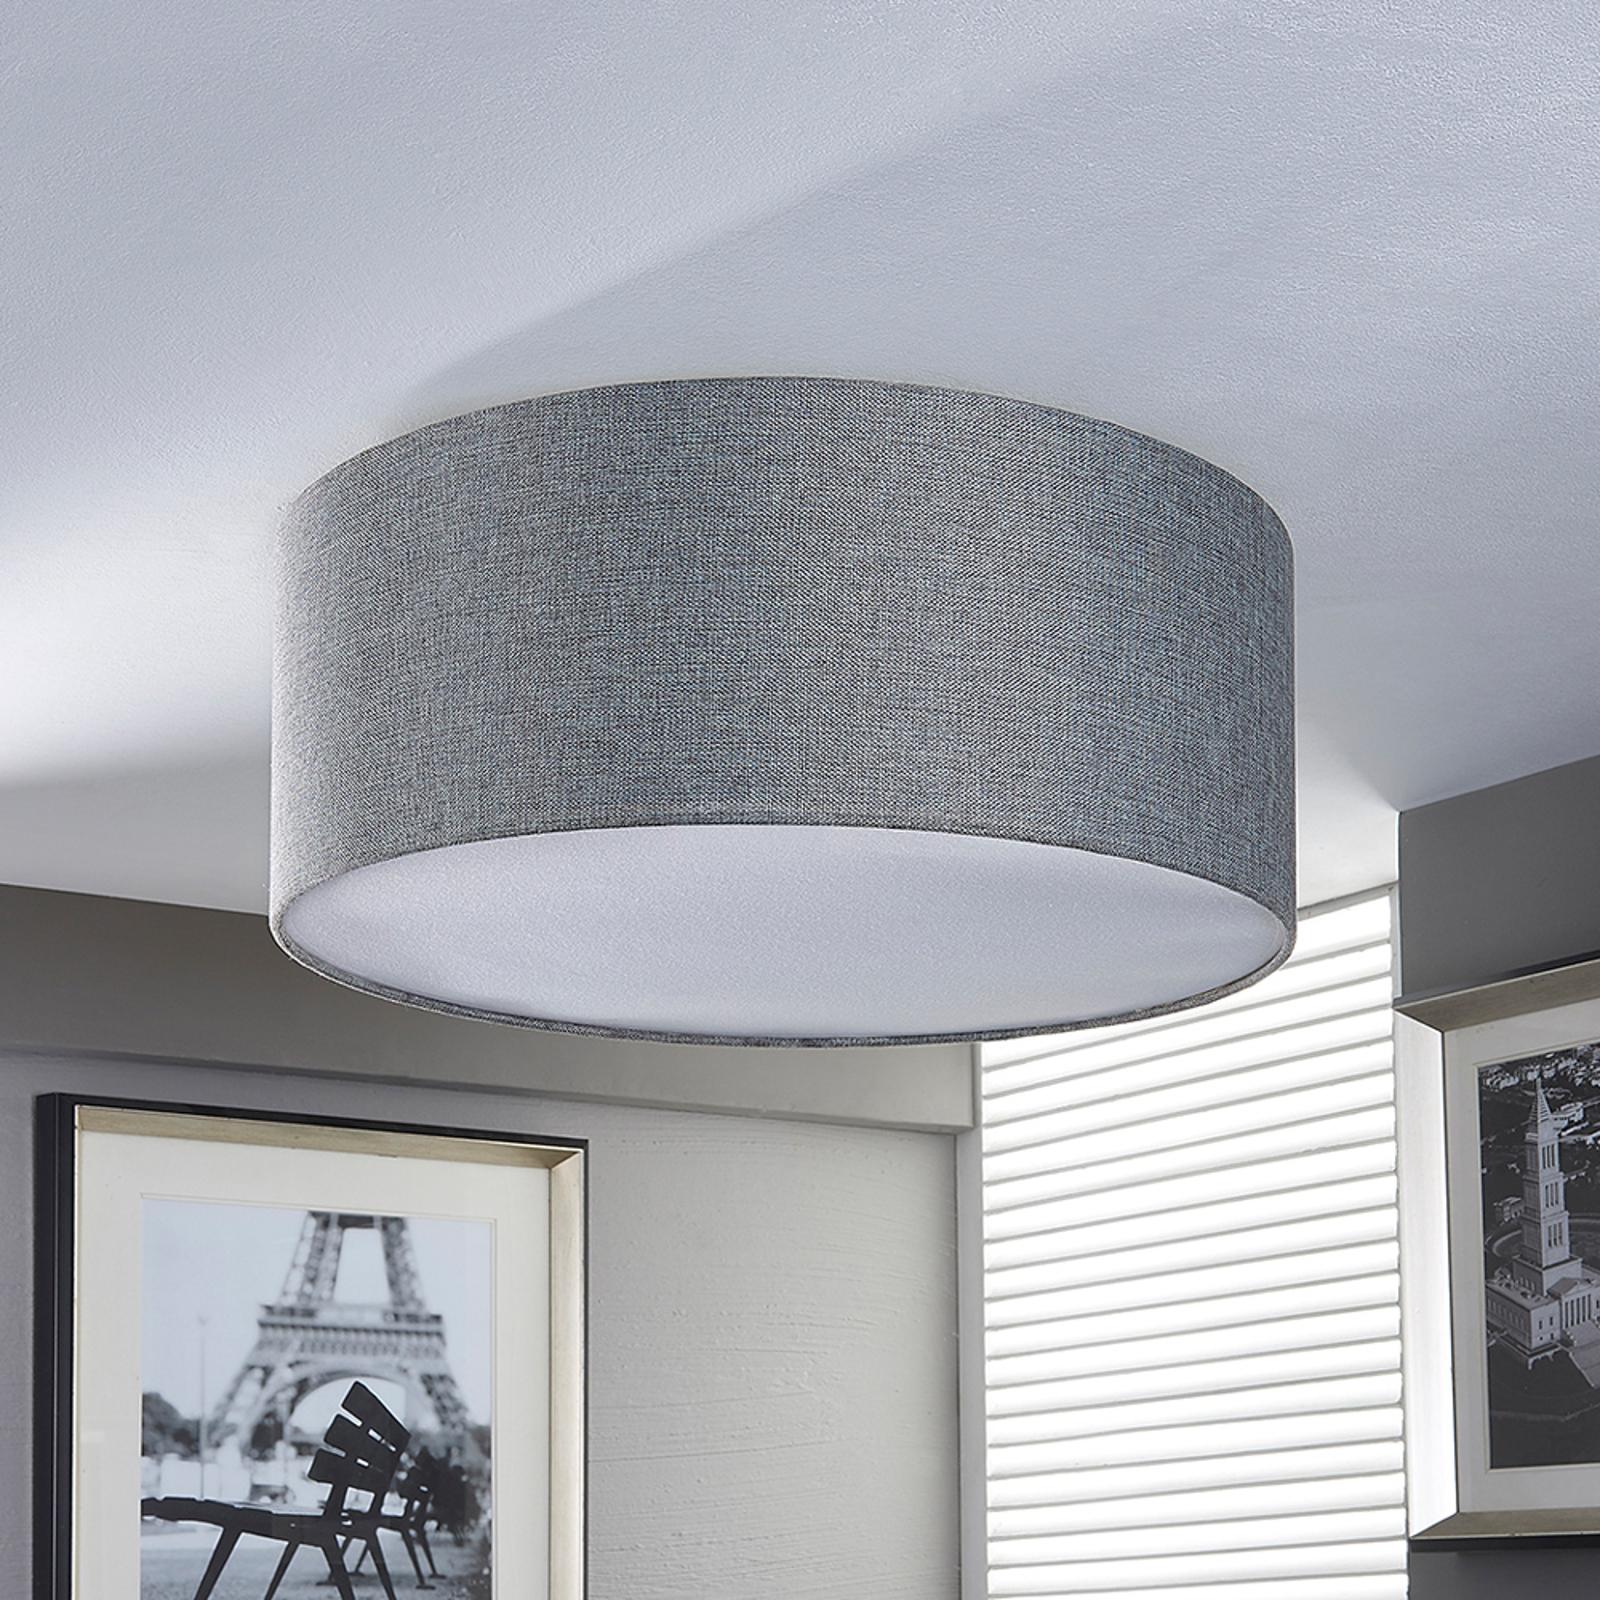 Zilvergr stoffen plafondlamp pitta m linnen look